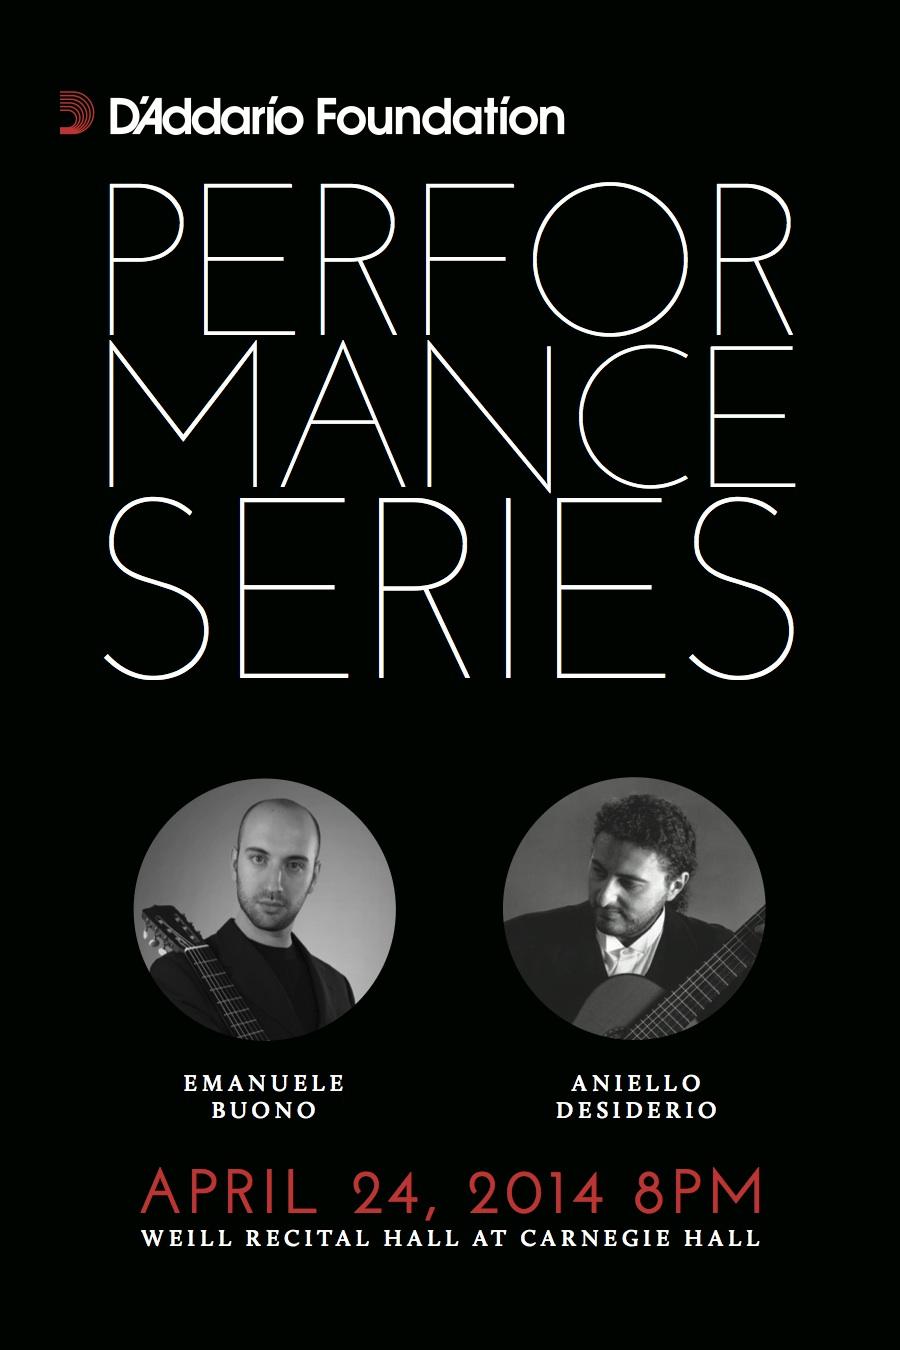 D'Addario Performance Series